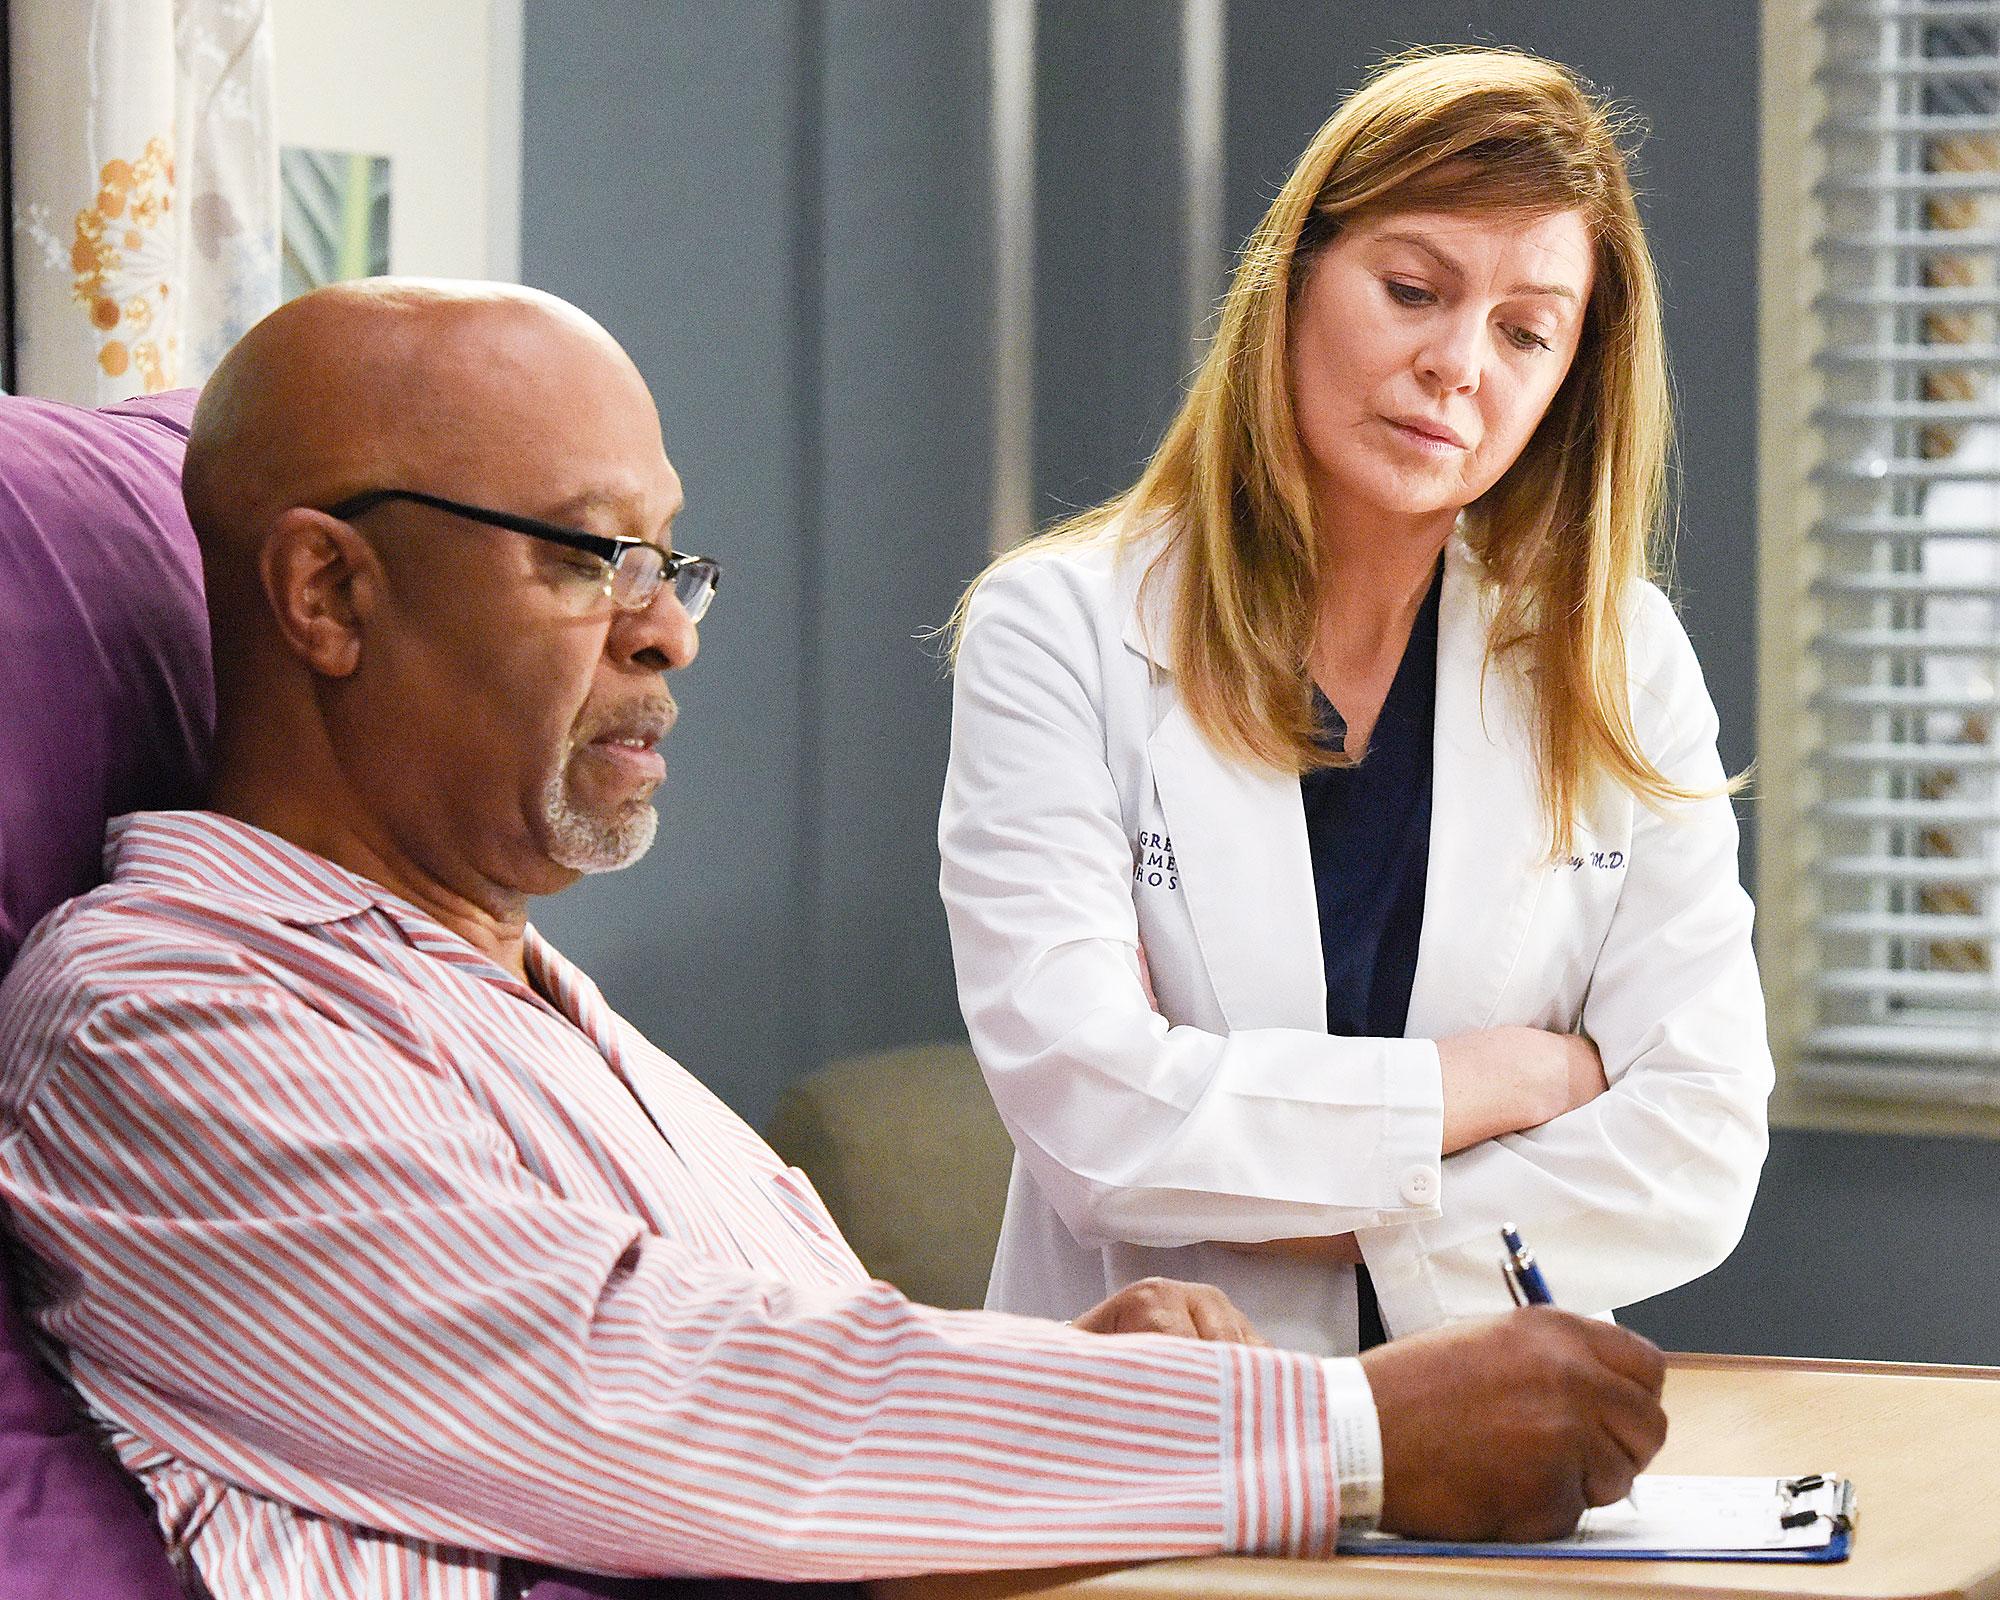 James Pickens Jr and Ellen Pompeo on Greys Anatomy How Greys Anatomy Is Preparing to Cover the Coronavirus Pandemic in Season 17